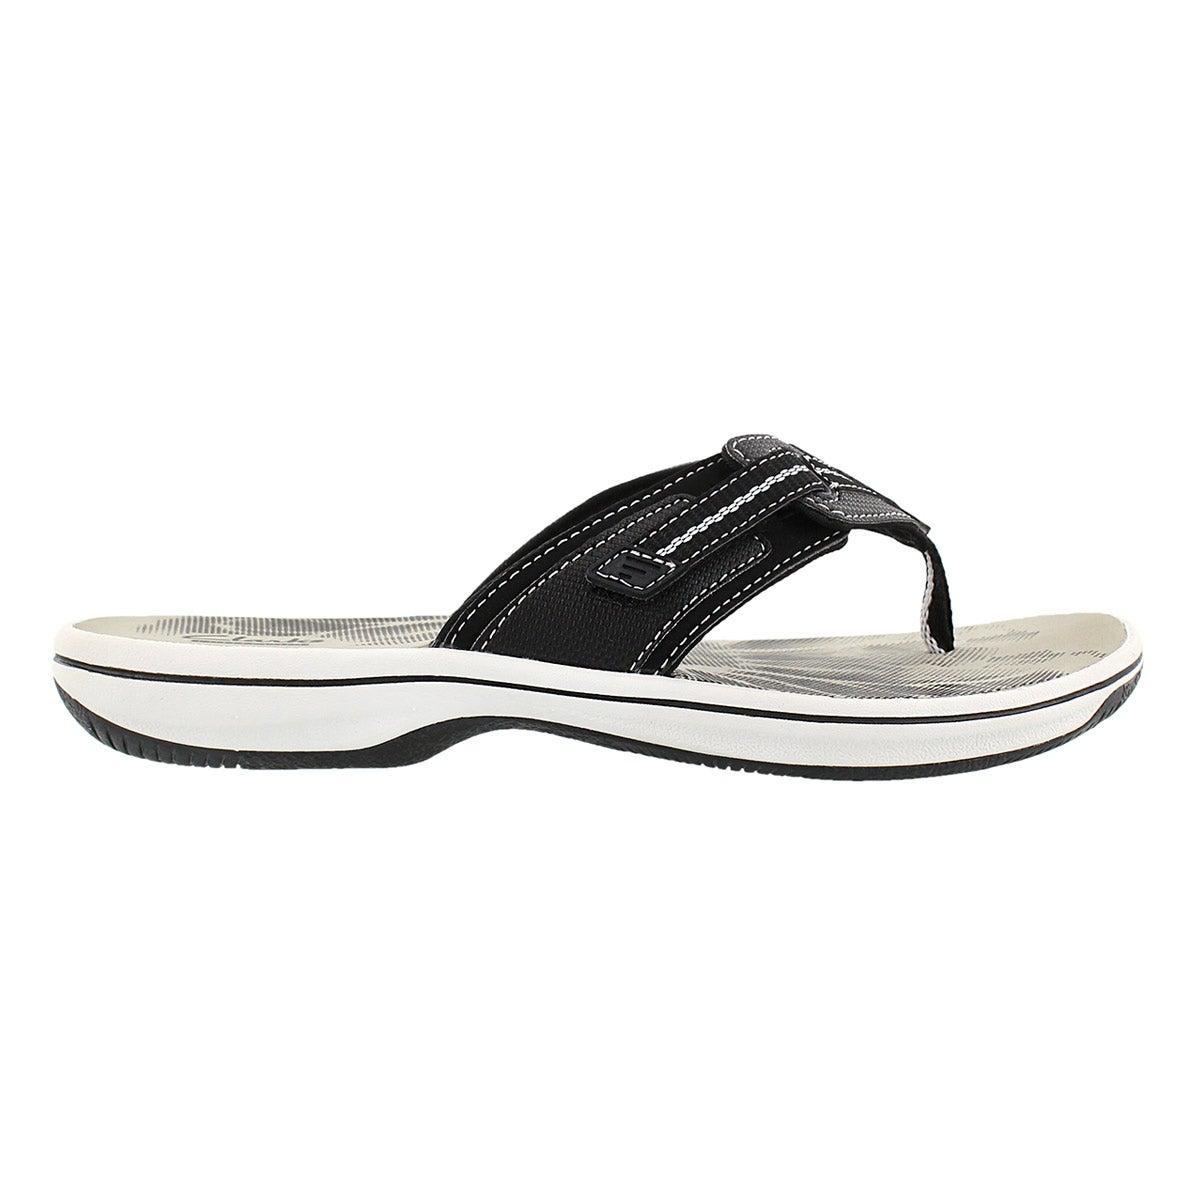 Lds Brinkley Jazz black thong sandal